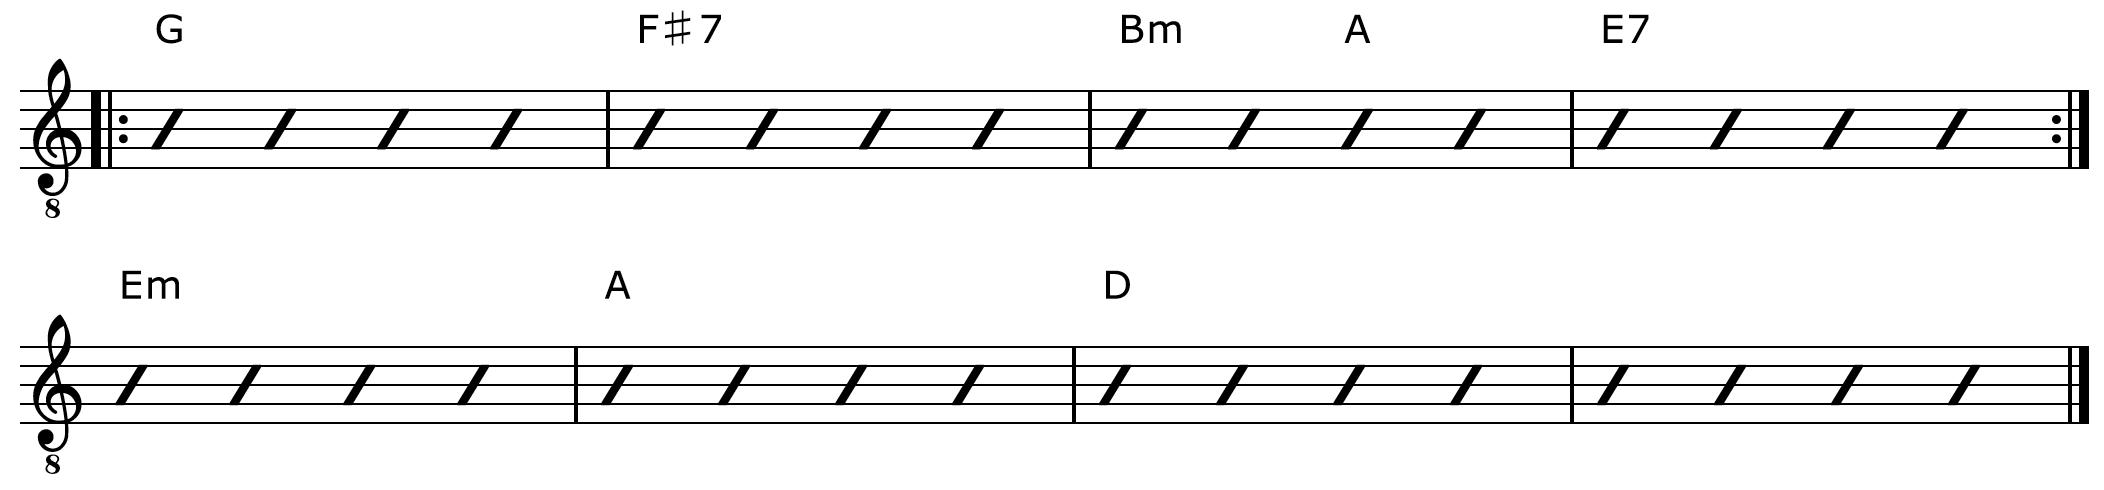 6th Harmony Fingerpicking Chord Progression